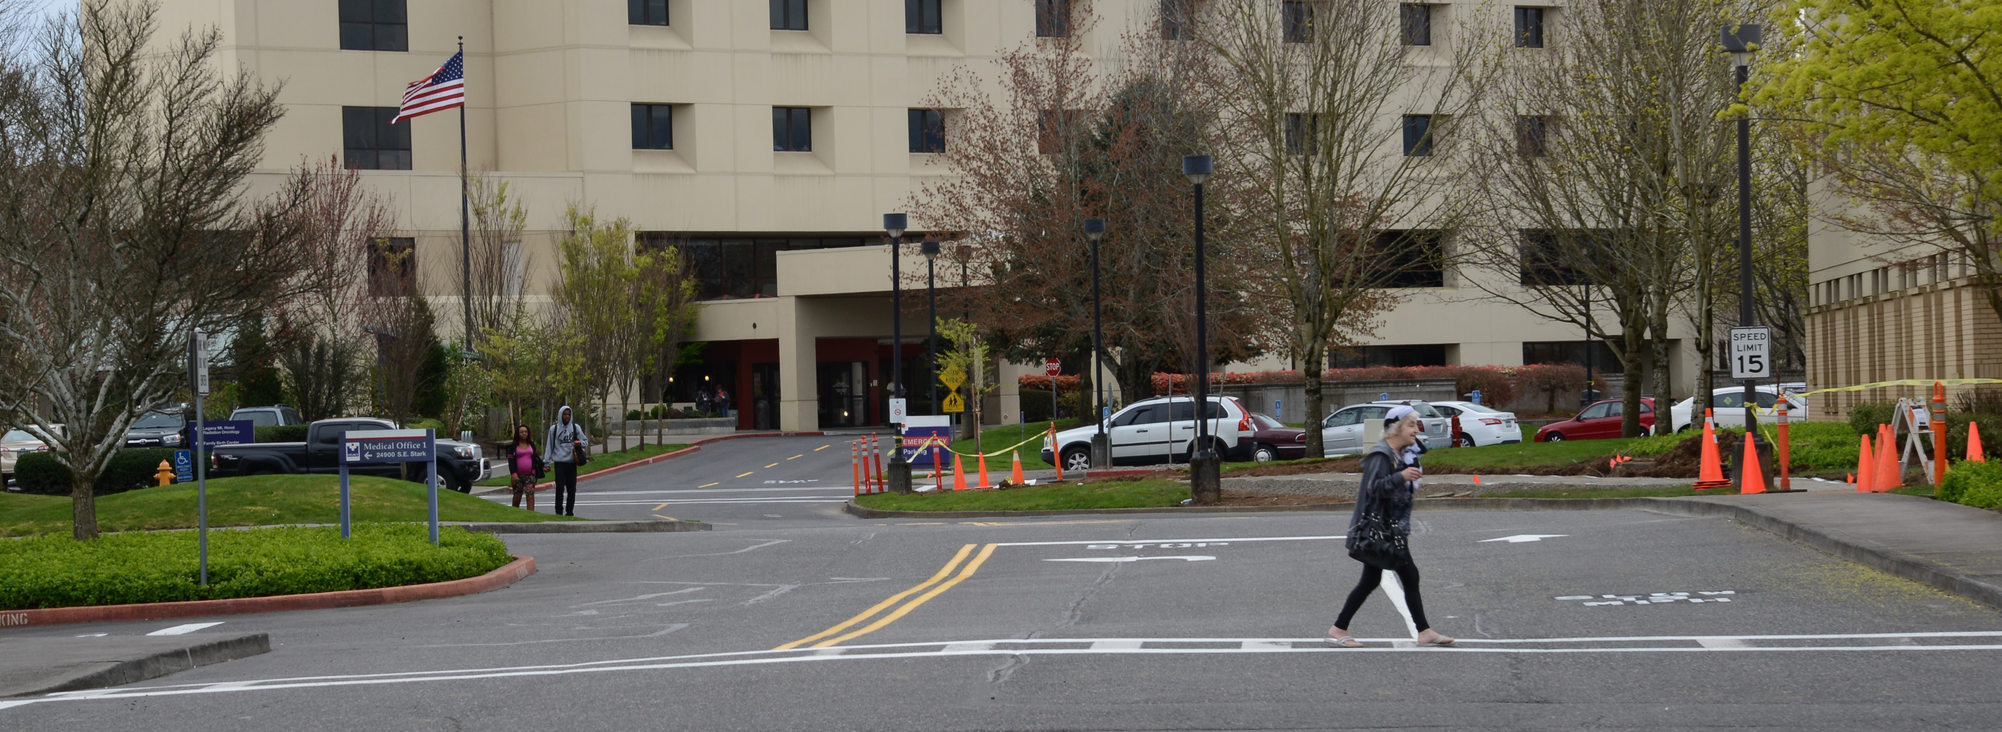 Legacy Mt. Hood Medical Center, Gresham